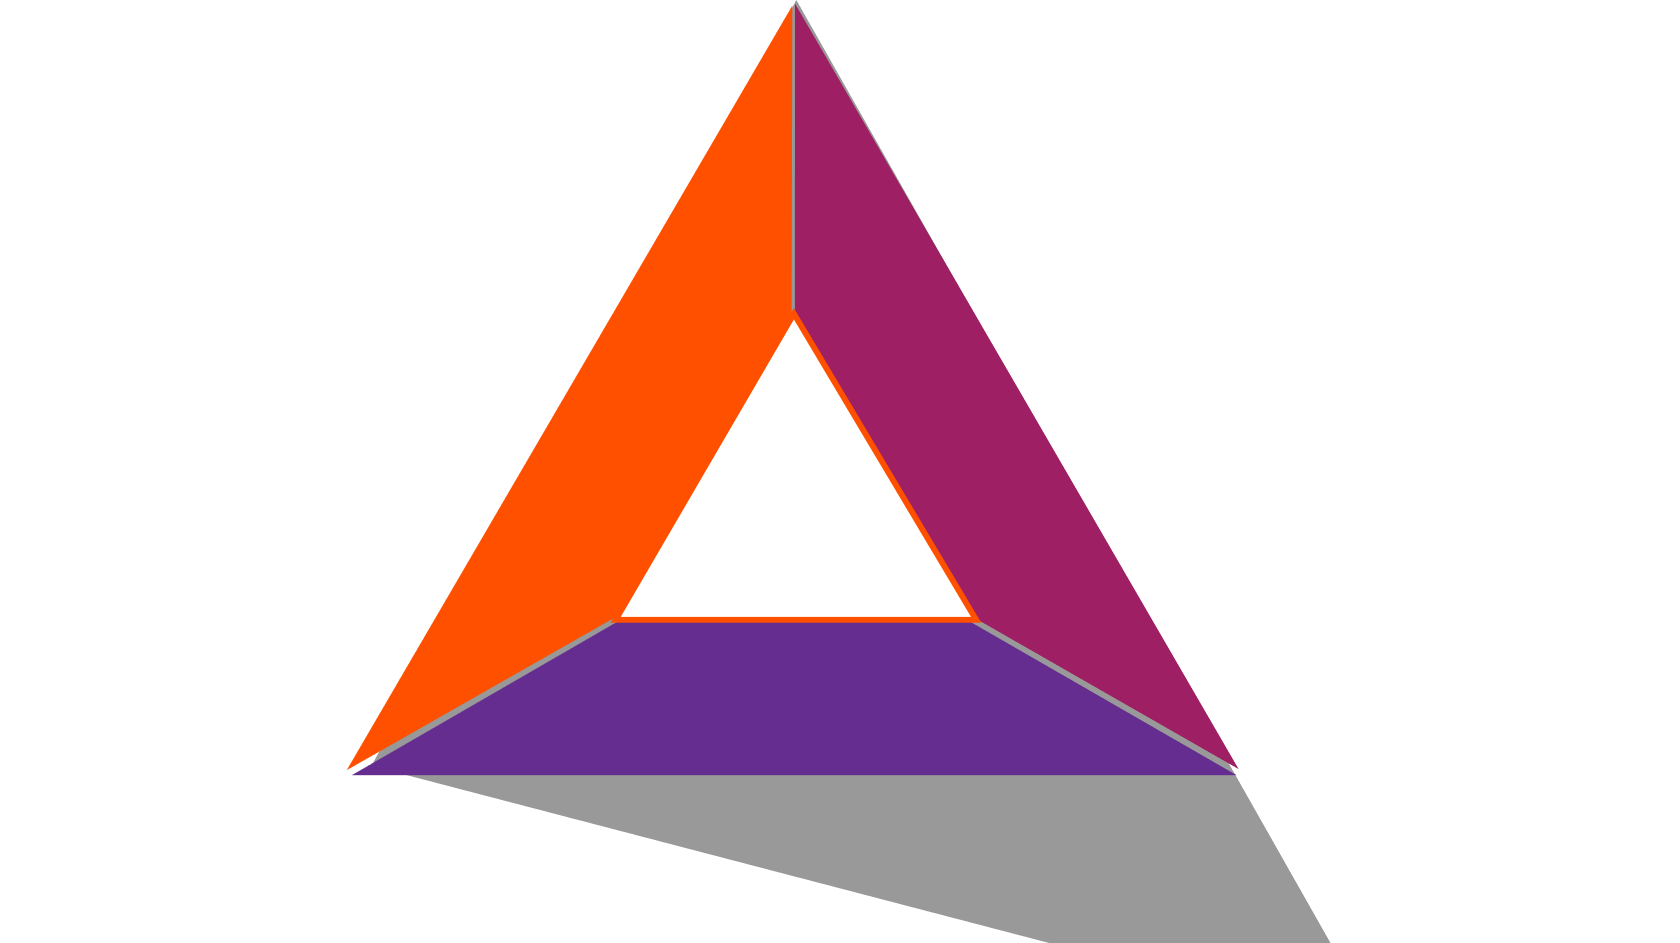 Basic Attention Token symbol